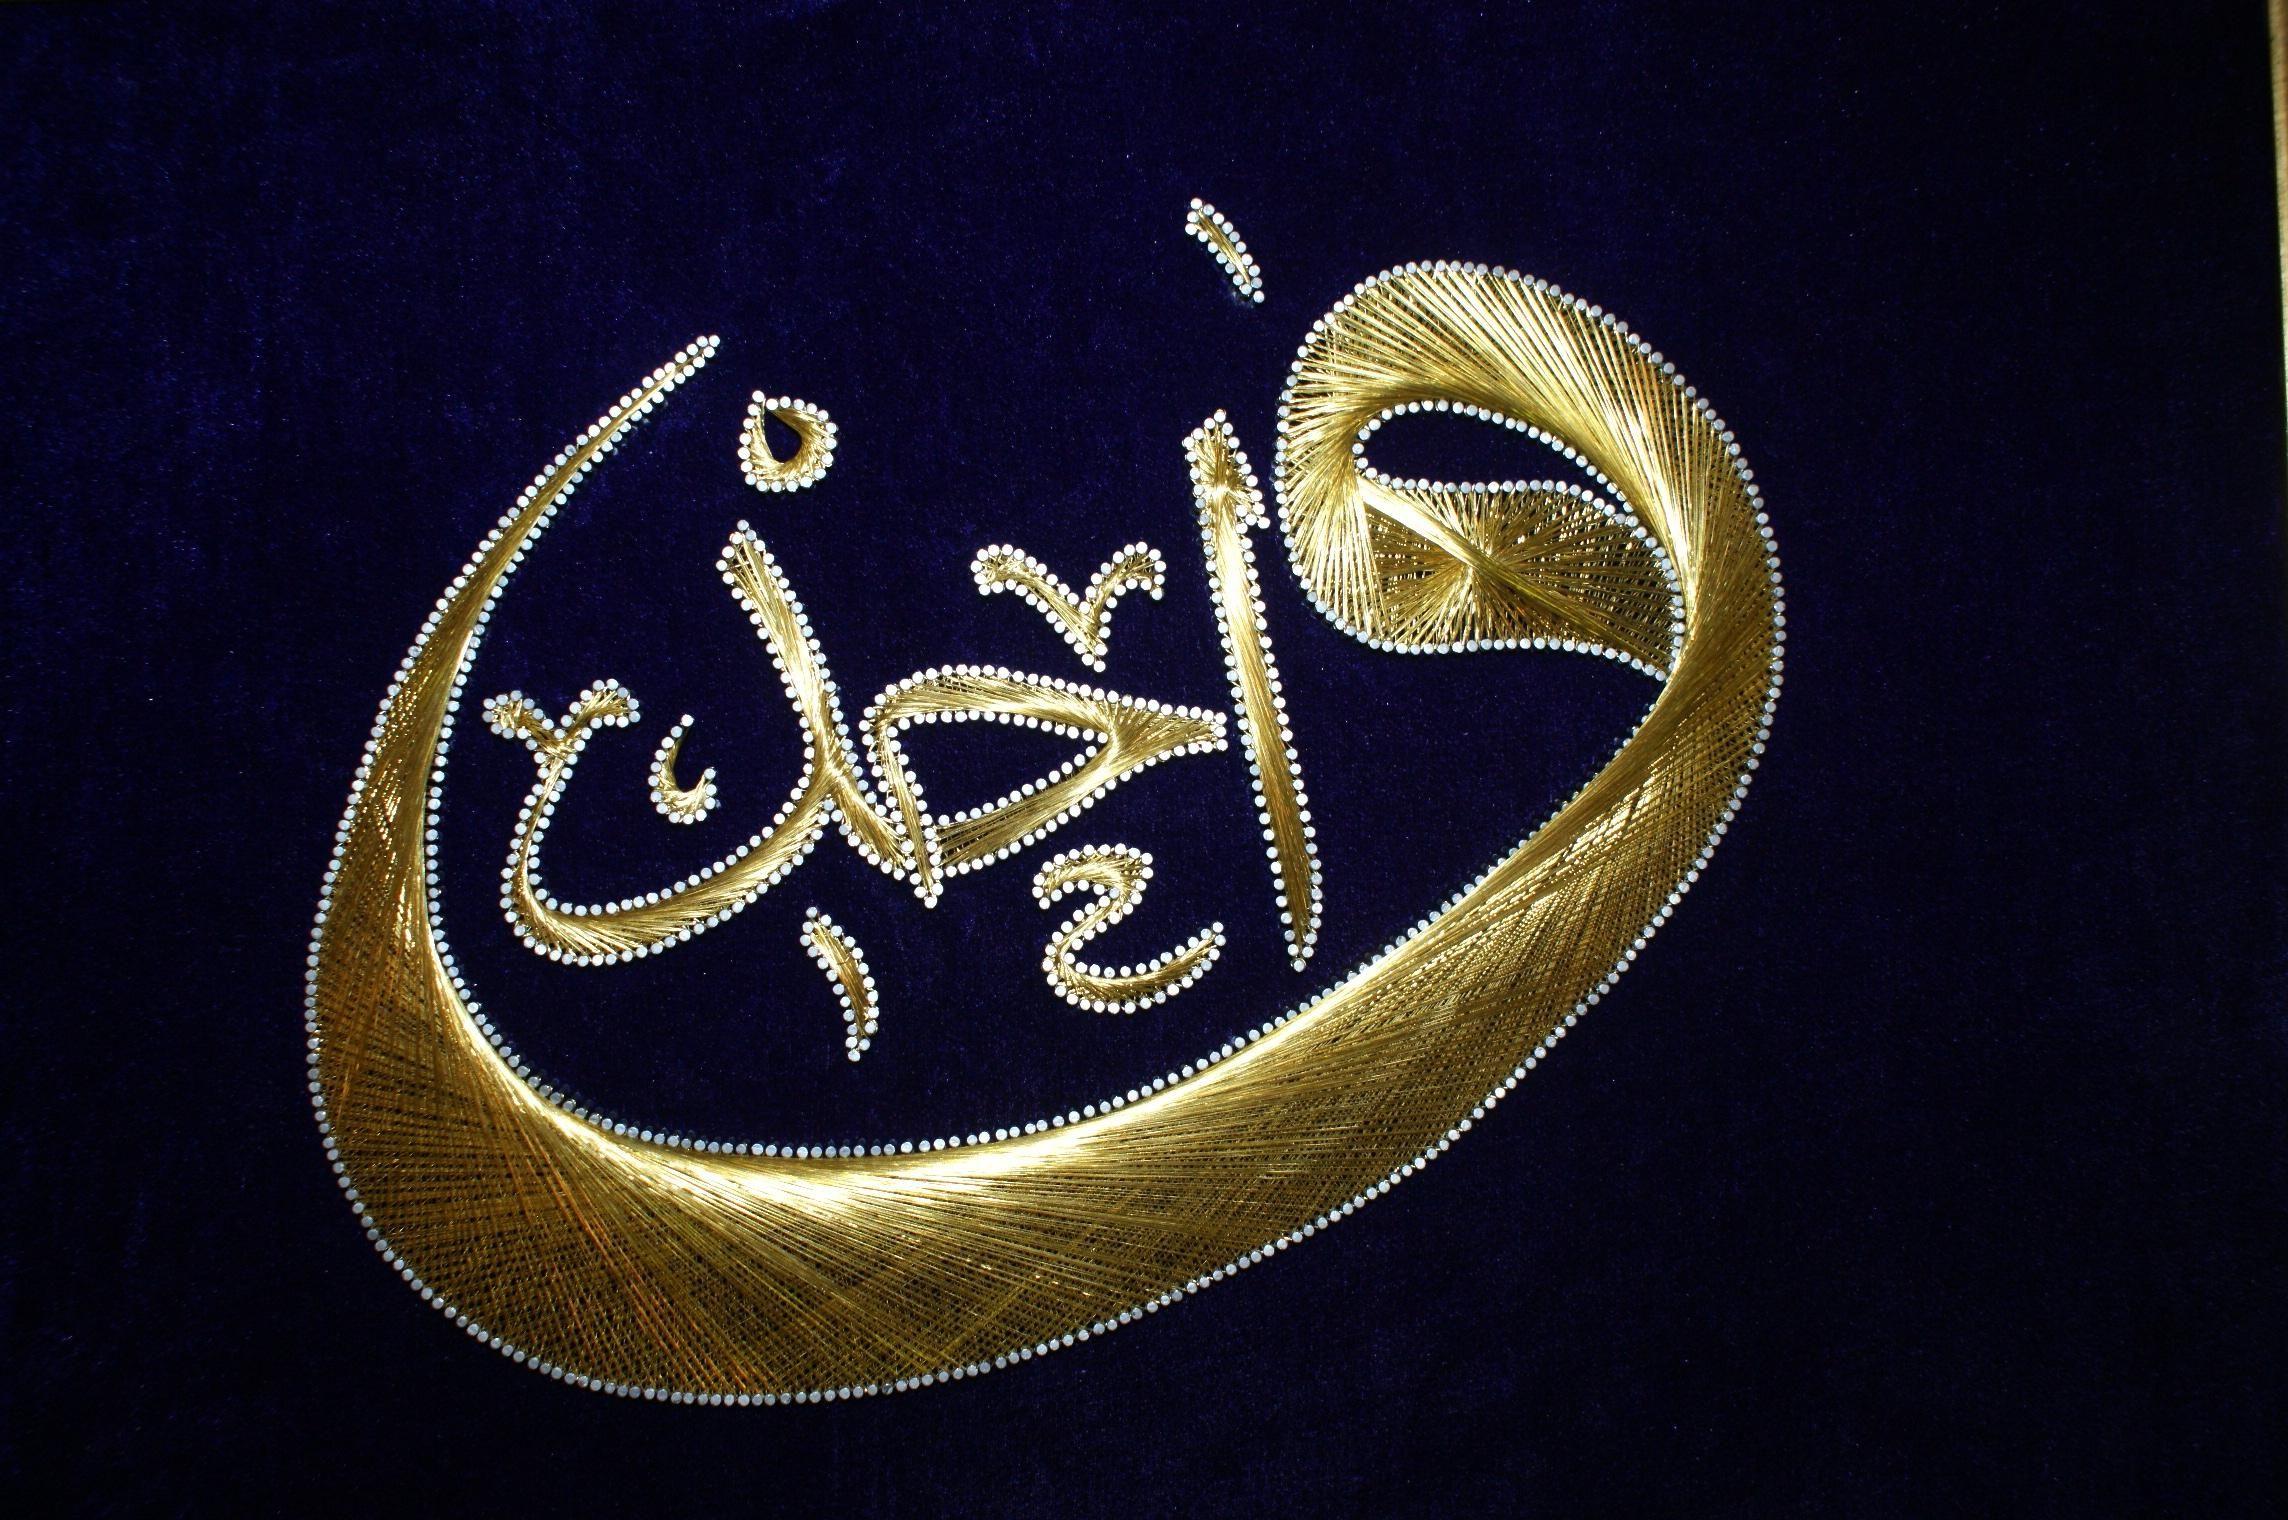 Tahribat Com Filografi Sanati Desenler Sanat Desen Sanat